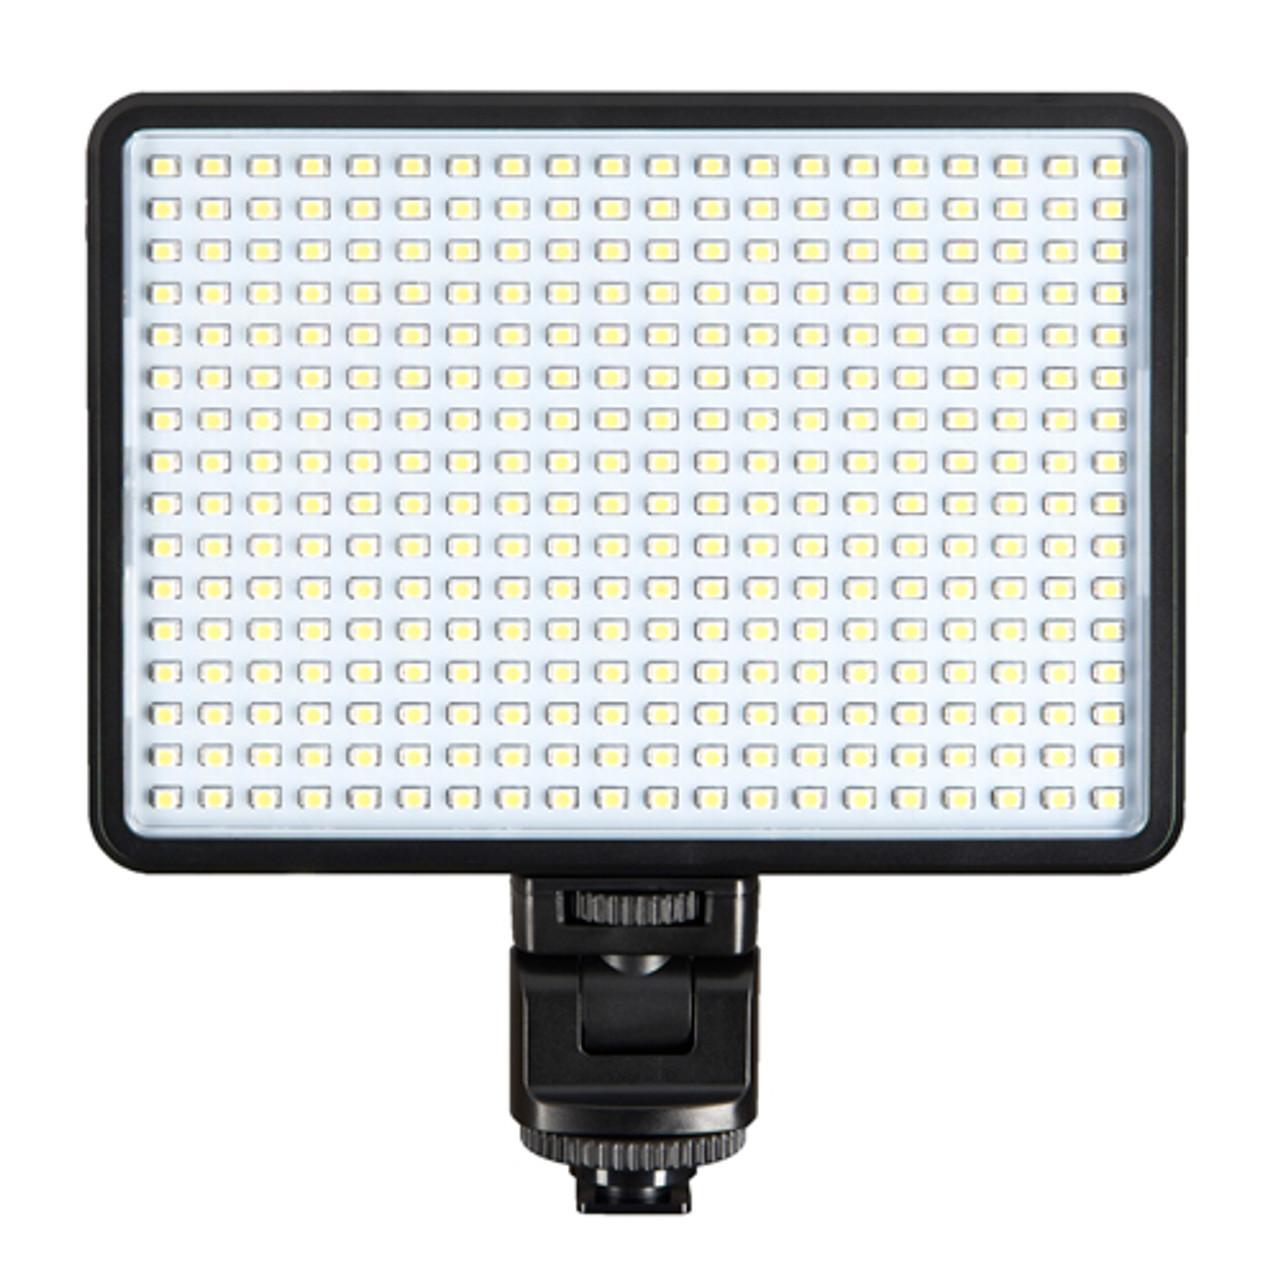 Promaster LED-320SS Plus Super Slim Rechargeable LED Light